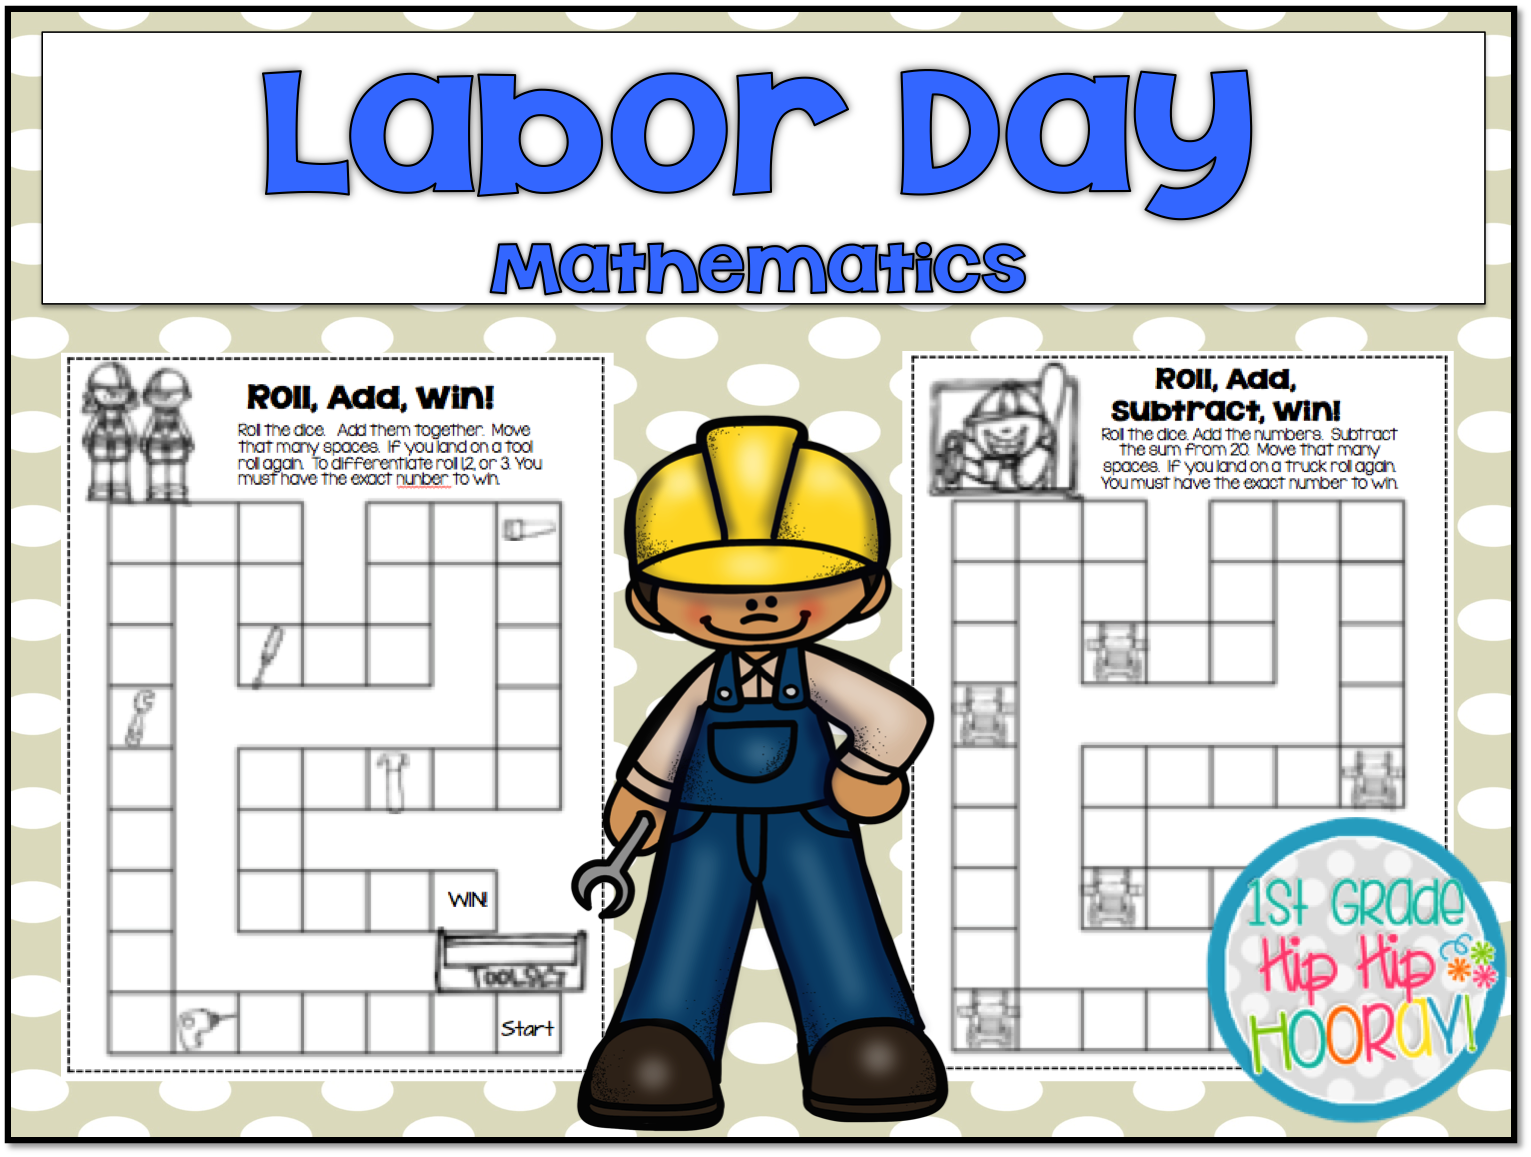 small resolution of 1st Grade Hip Hip Hooray!: Labor Day! #morethanathreedayweekend